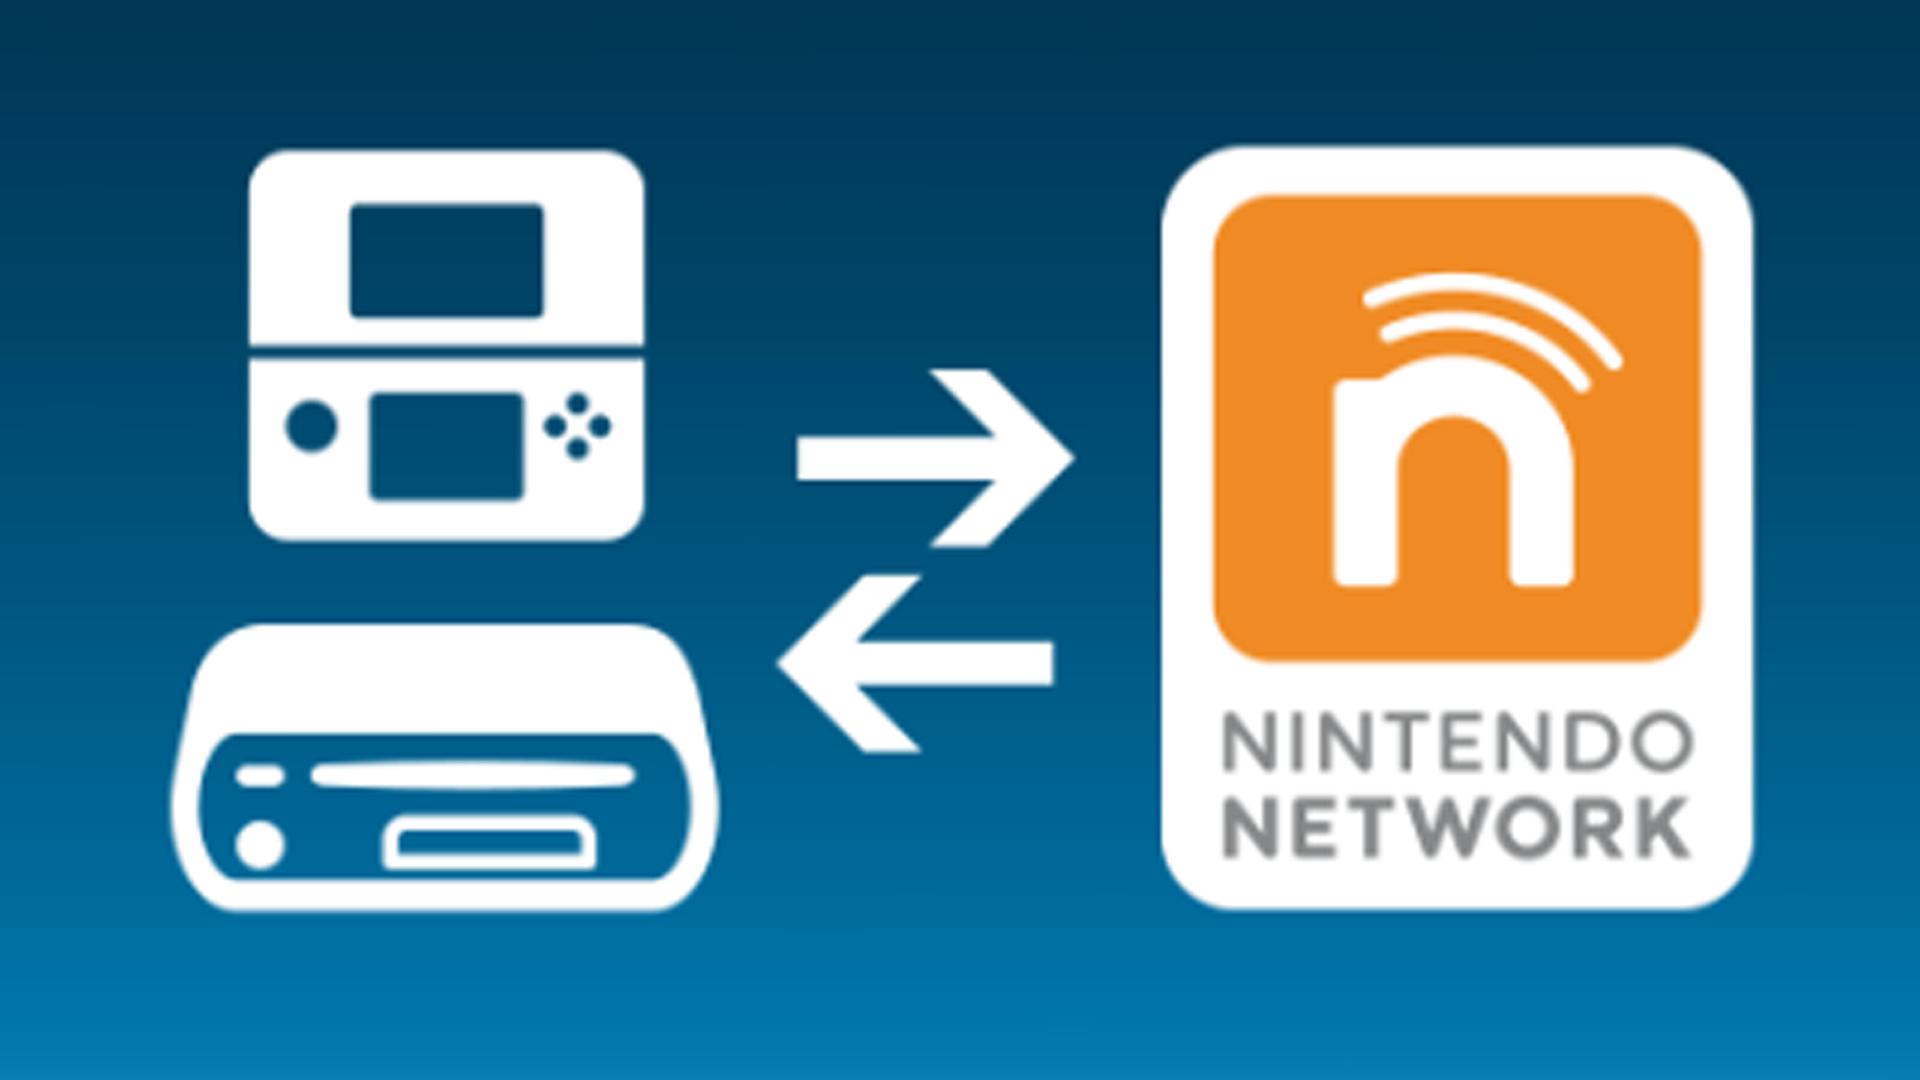 mantenimiento, nintendo network